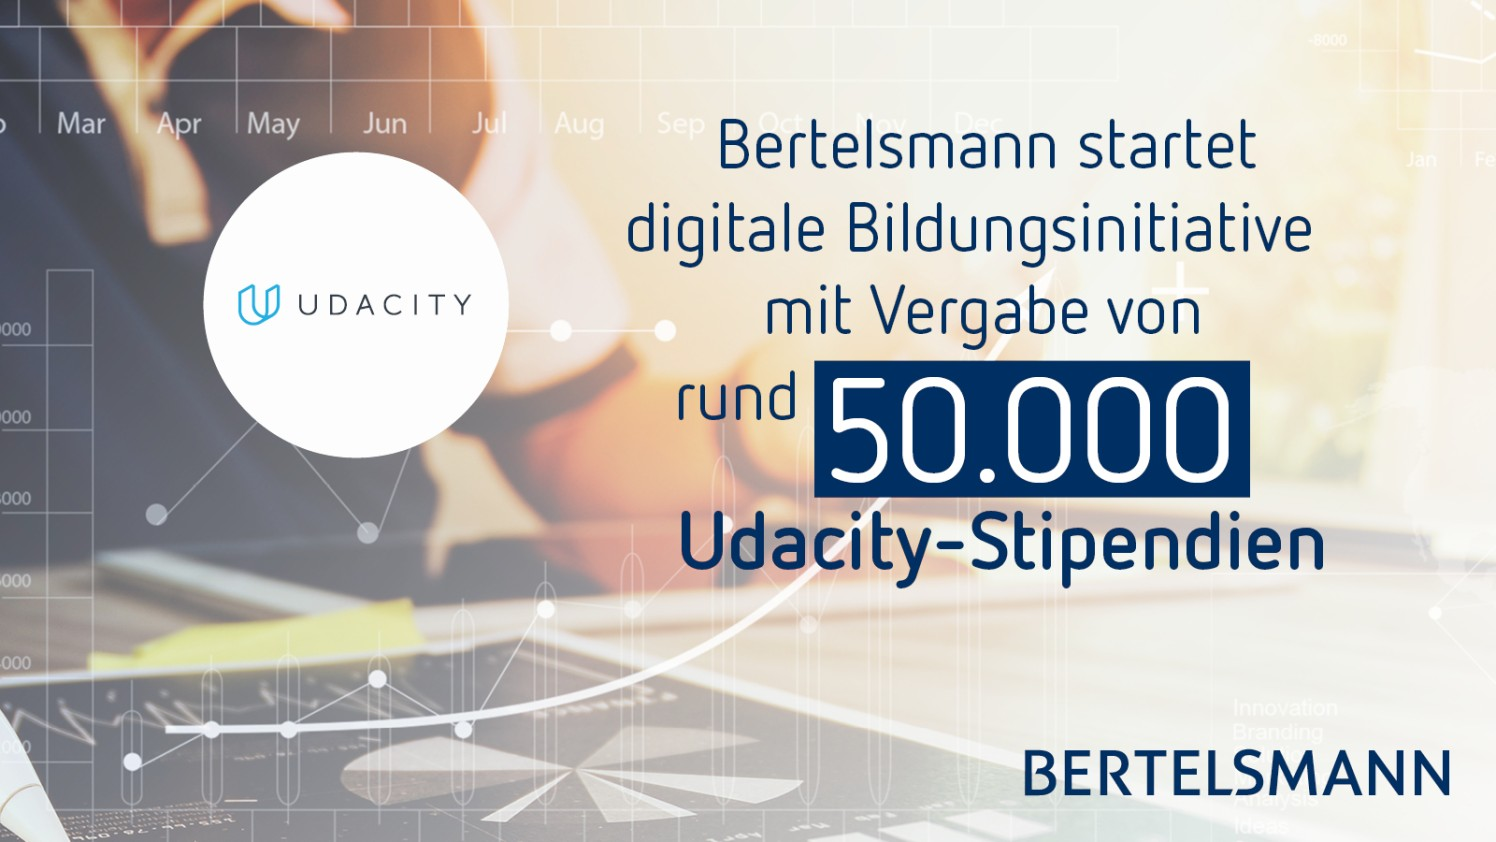 News & Media - Bertelsmann SE & Co  KGaA